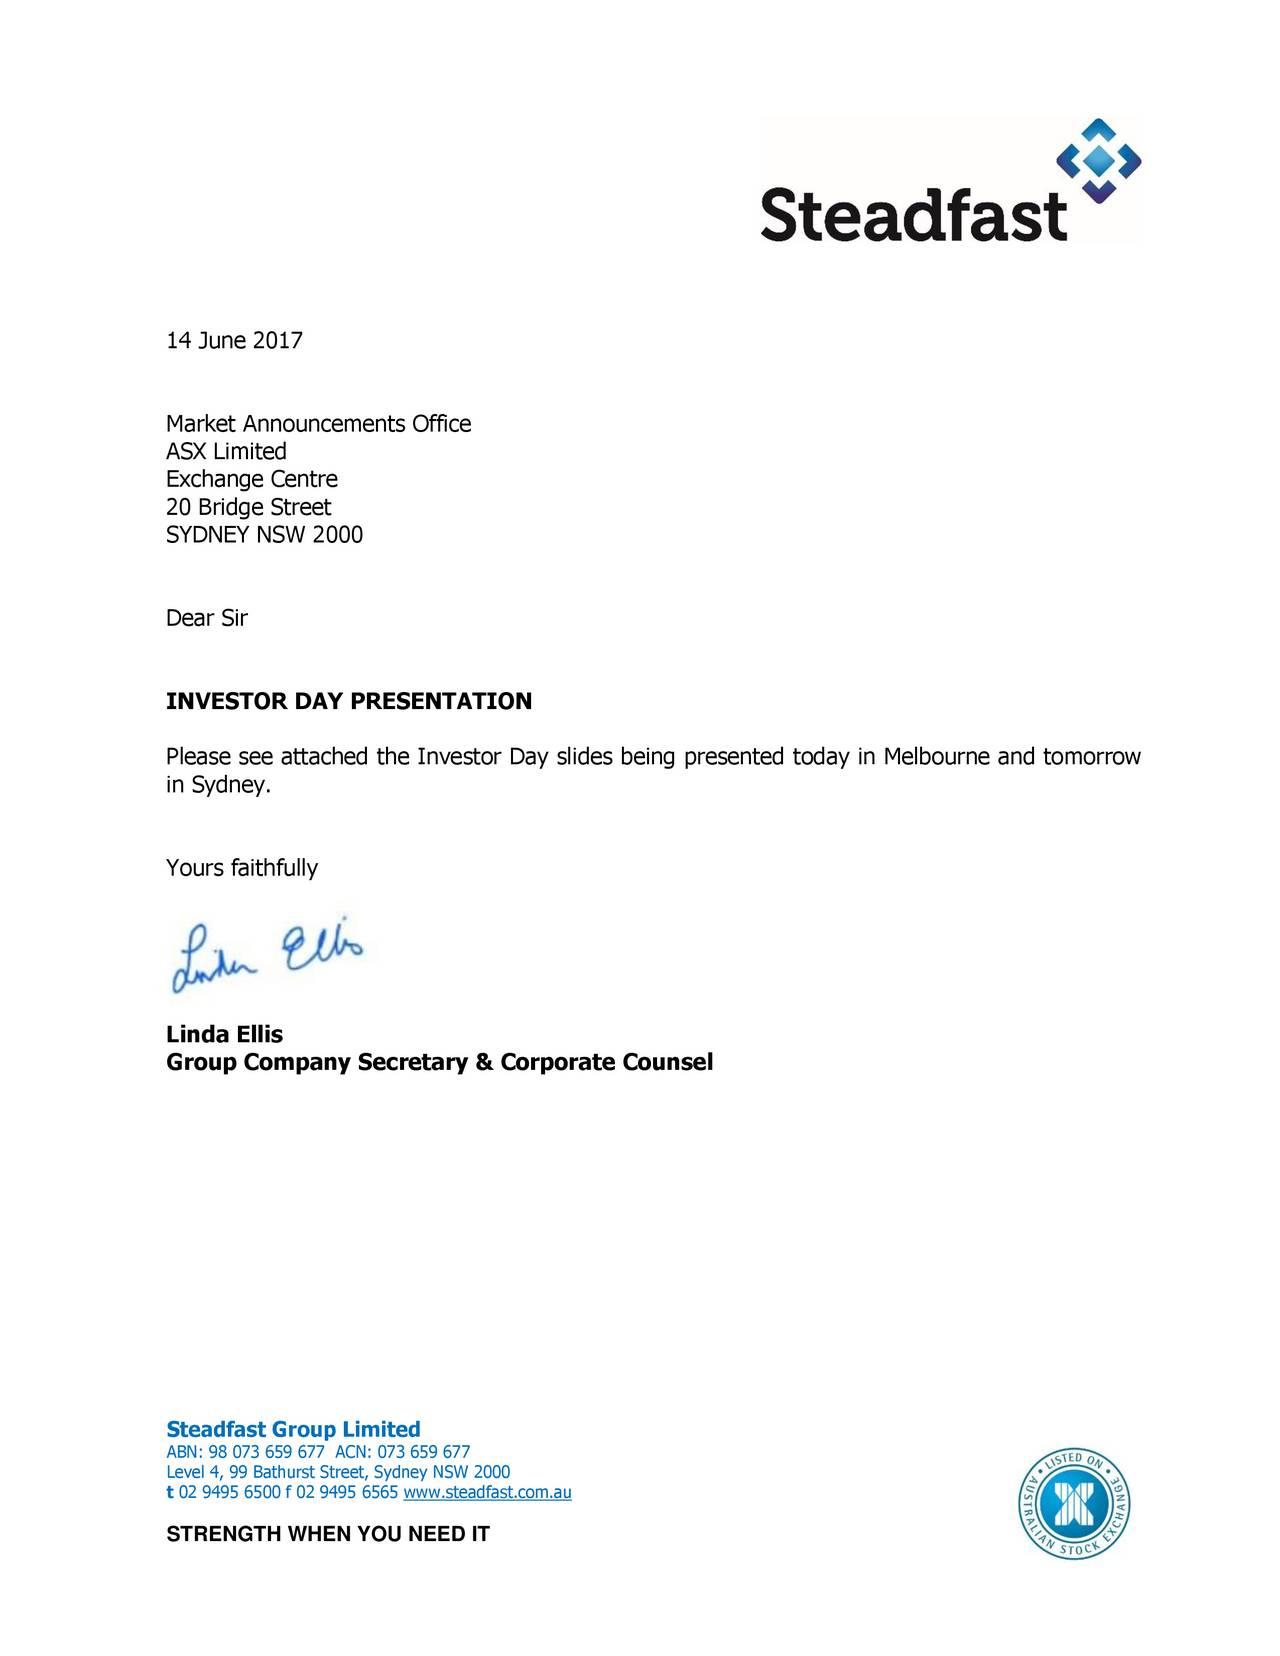 steadfast group sfglf investor presentation slideshow